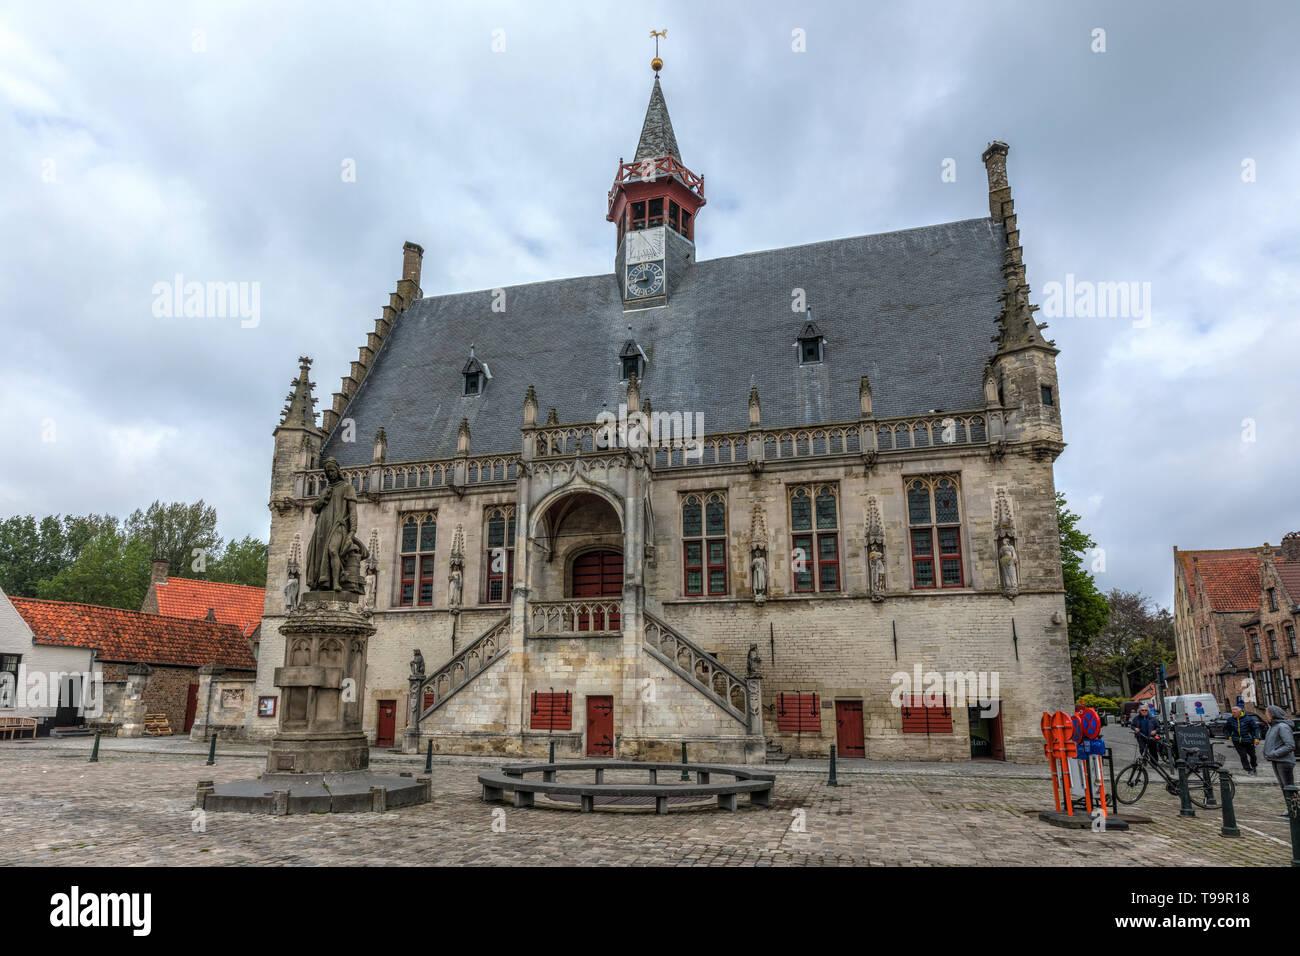 Damme, West Flanders, Belgium, Europe - Stock Image